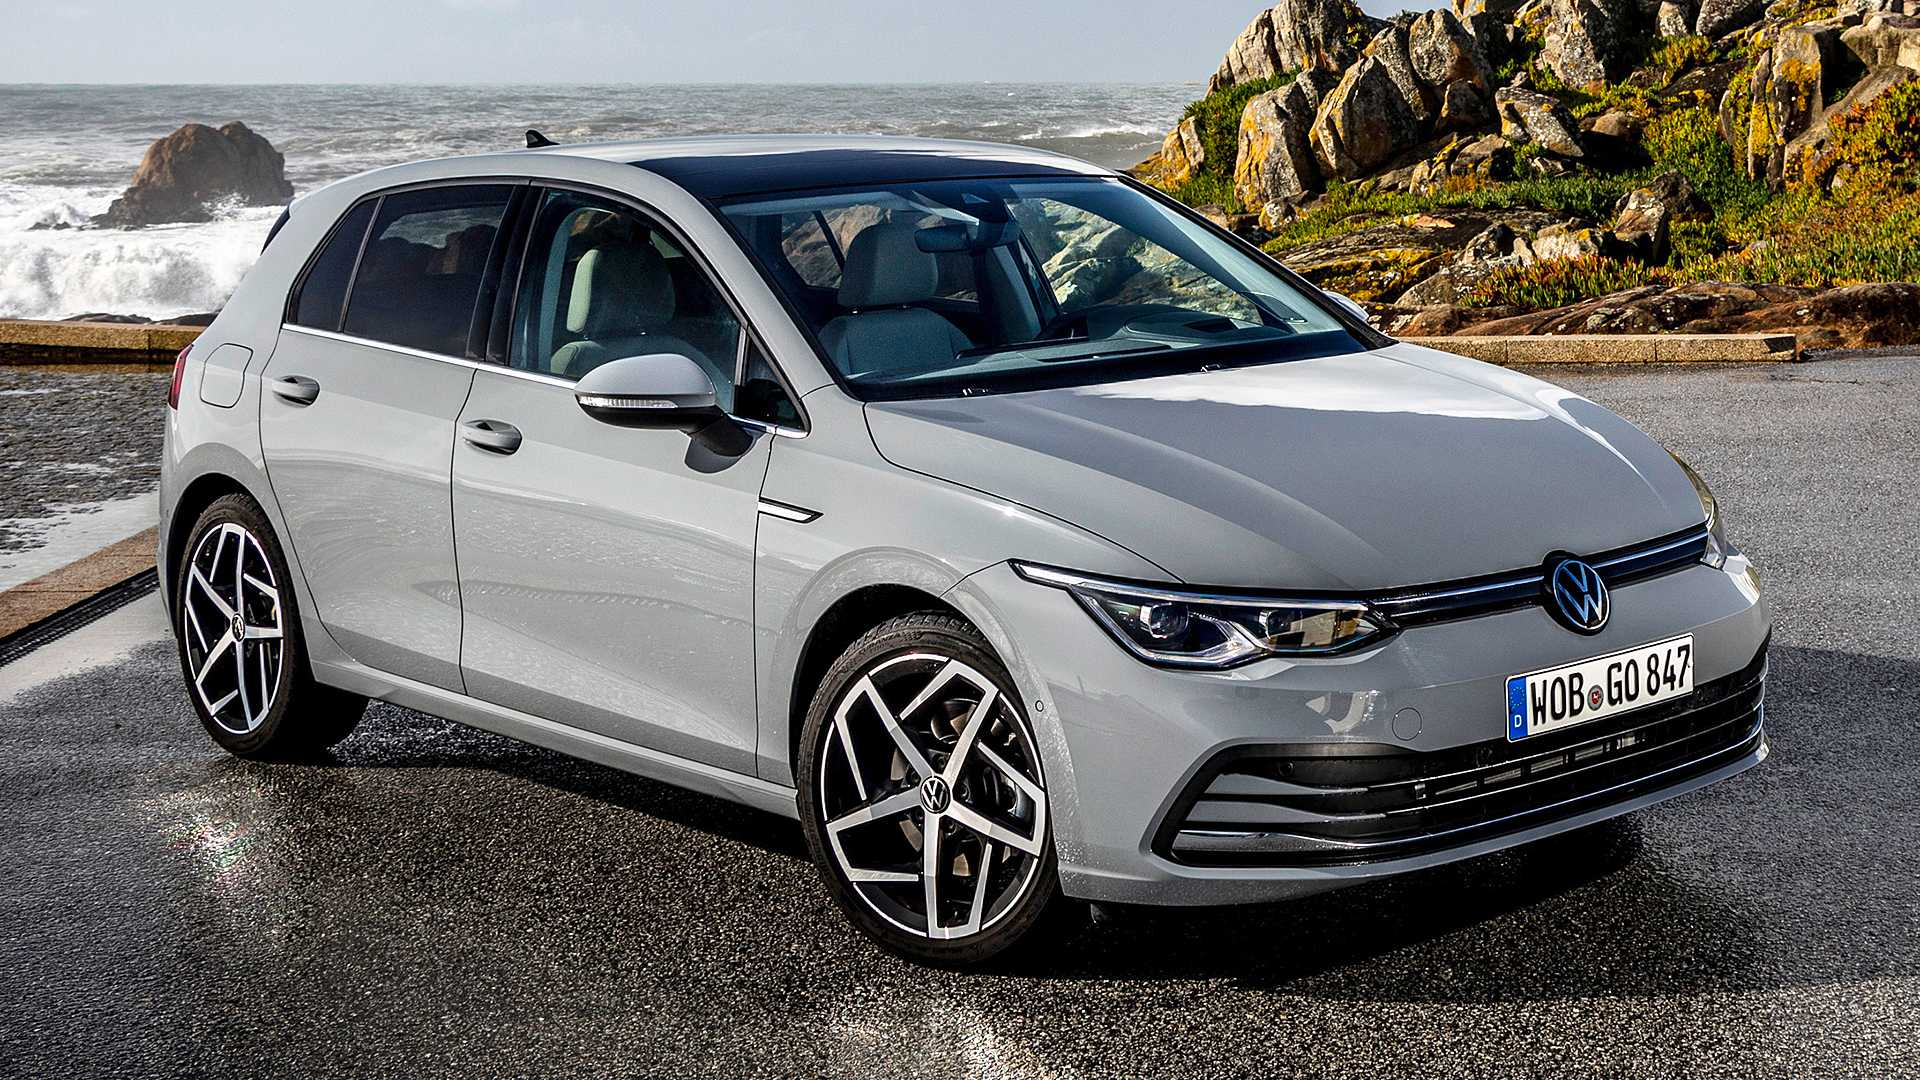 Volkswagen GOLF hybid automatica - 349 euro IVA inclusa